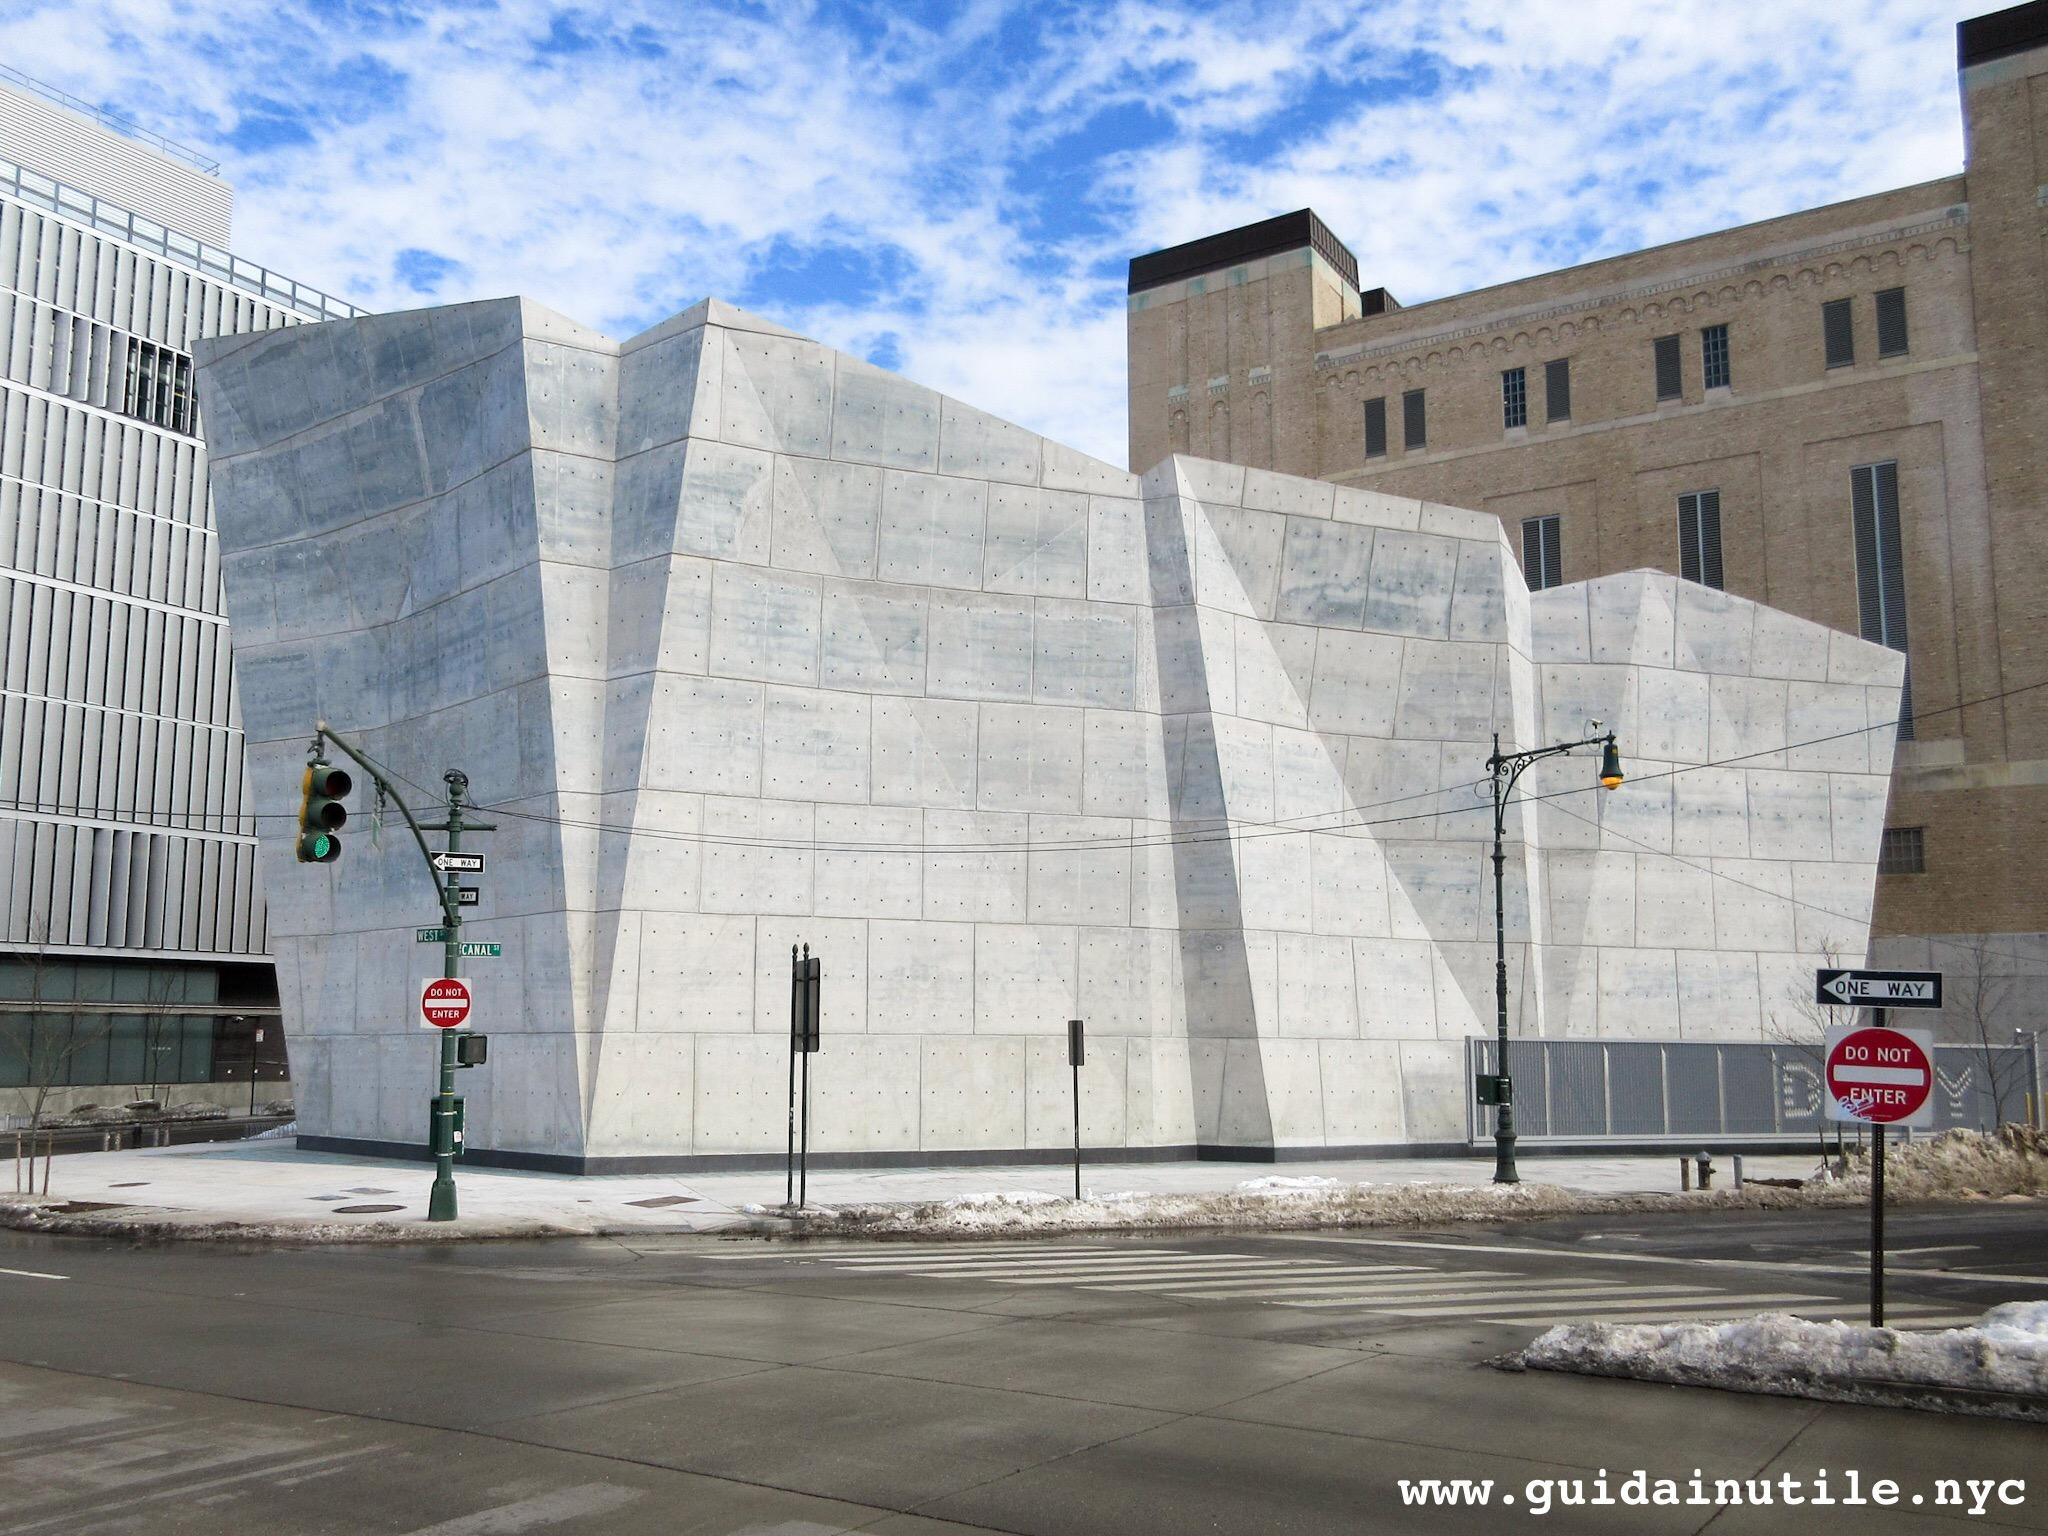 Architettura, Deposito sale stradale, Salt Shed, Hudson Square, Manhattan, New York City